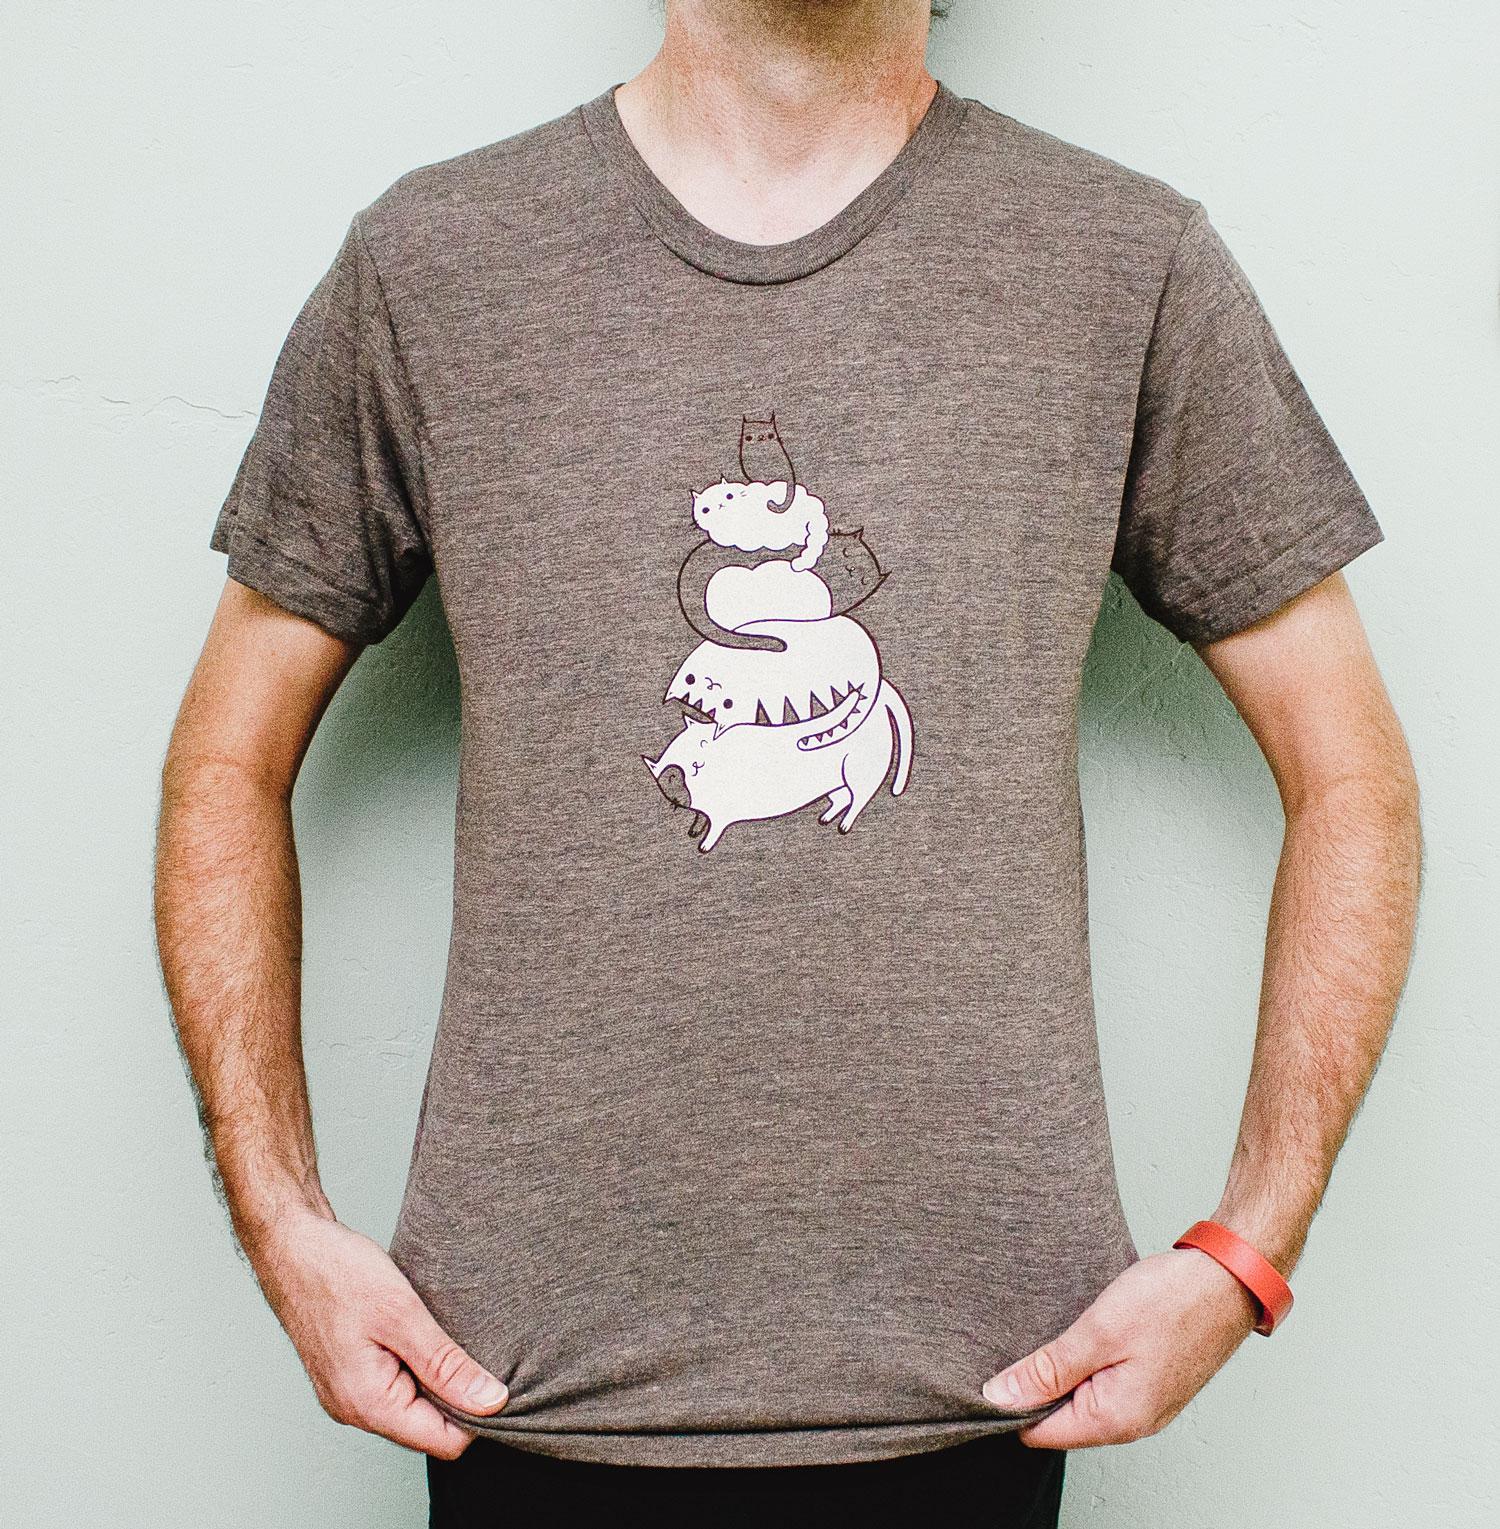 Cat t-shirt by boygirlparty